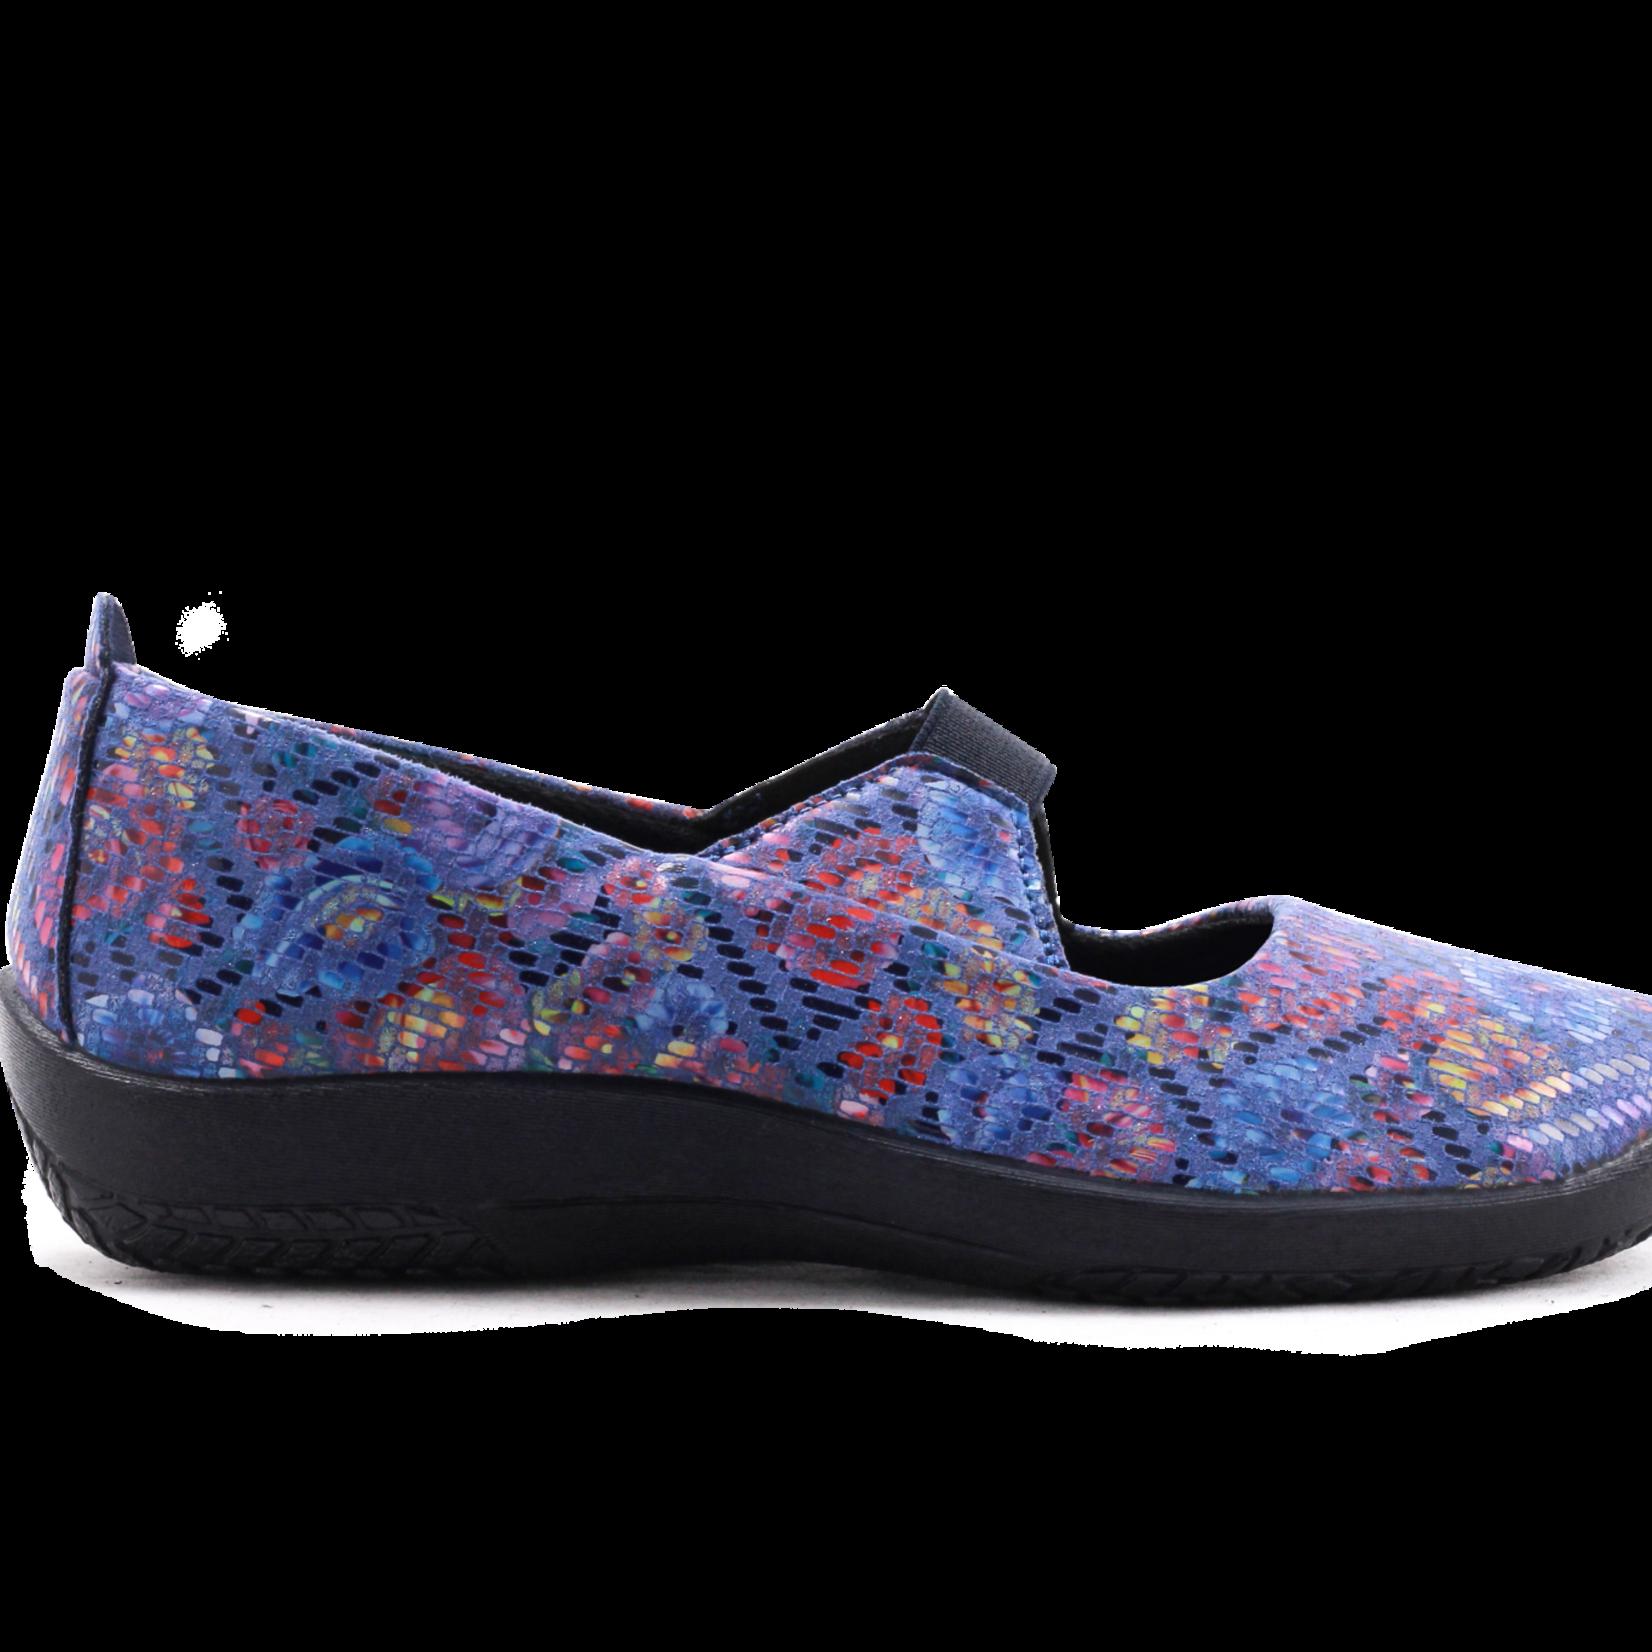 Arcopedico L Eina Lytech shoe